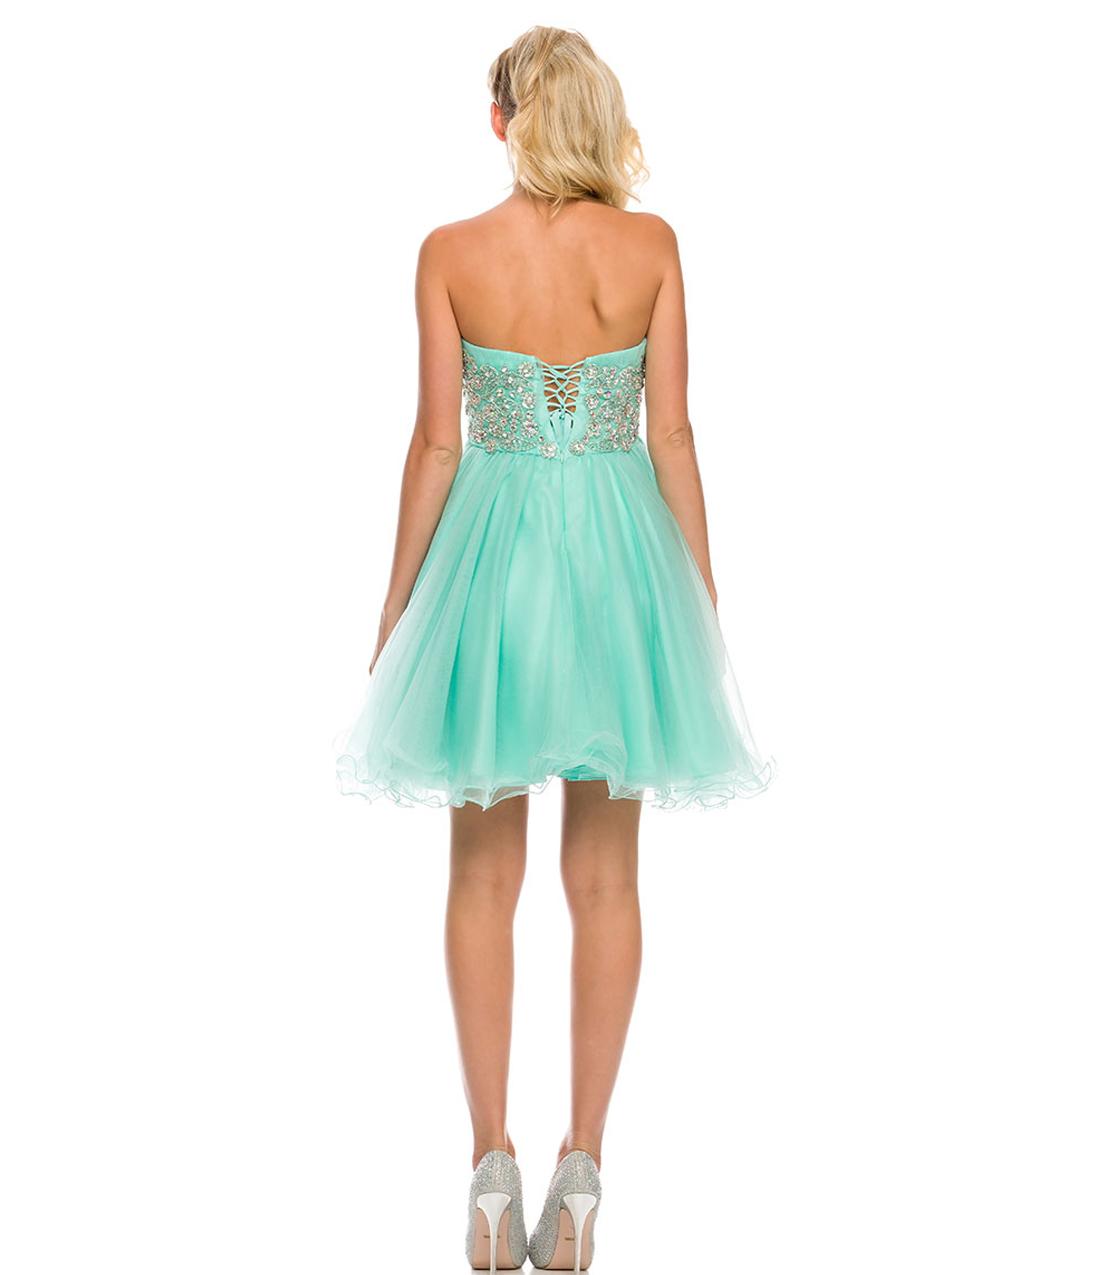 Strapless Sweetheart Crystal Embellished Short Prom Dress